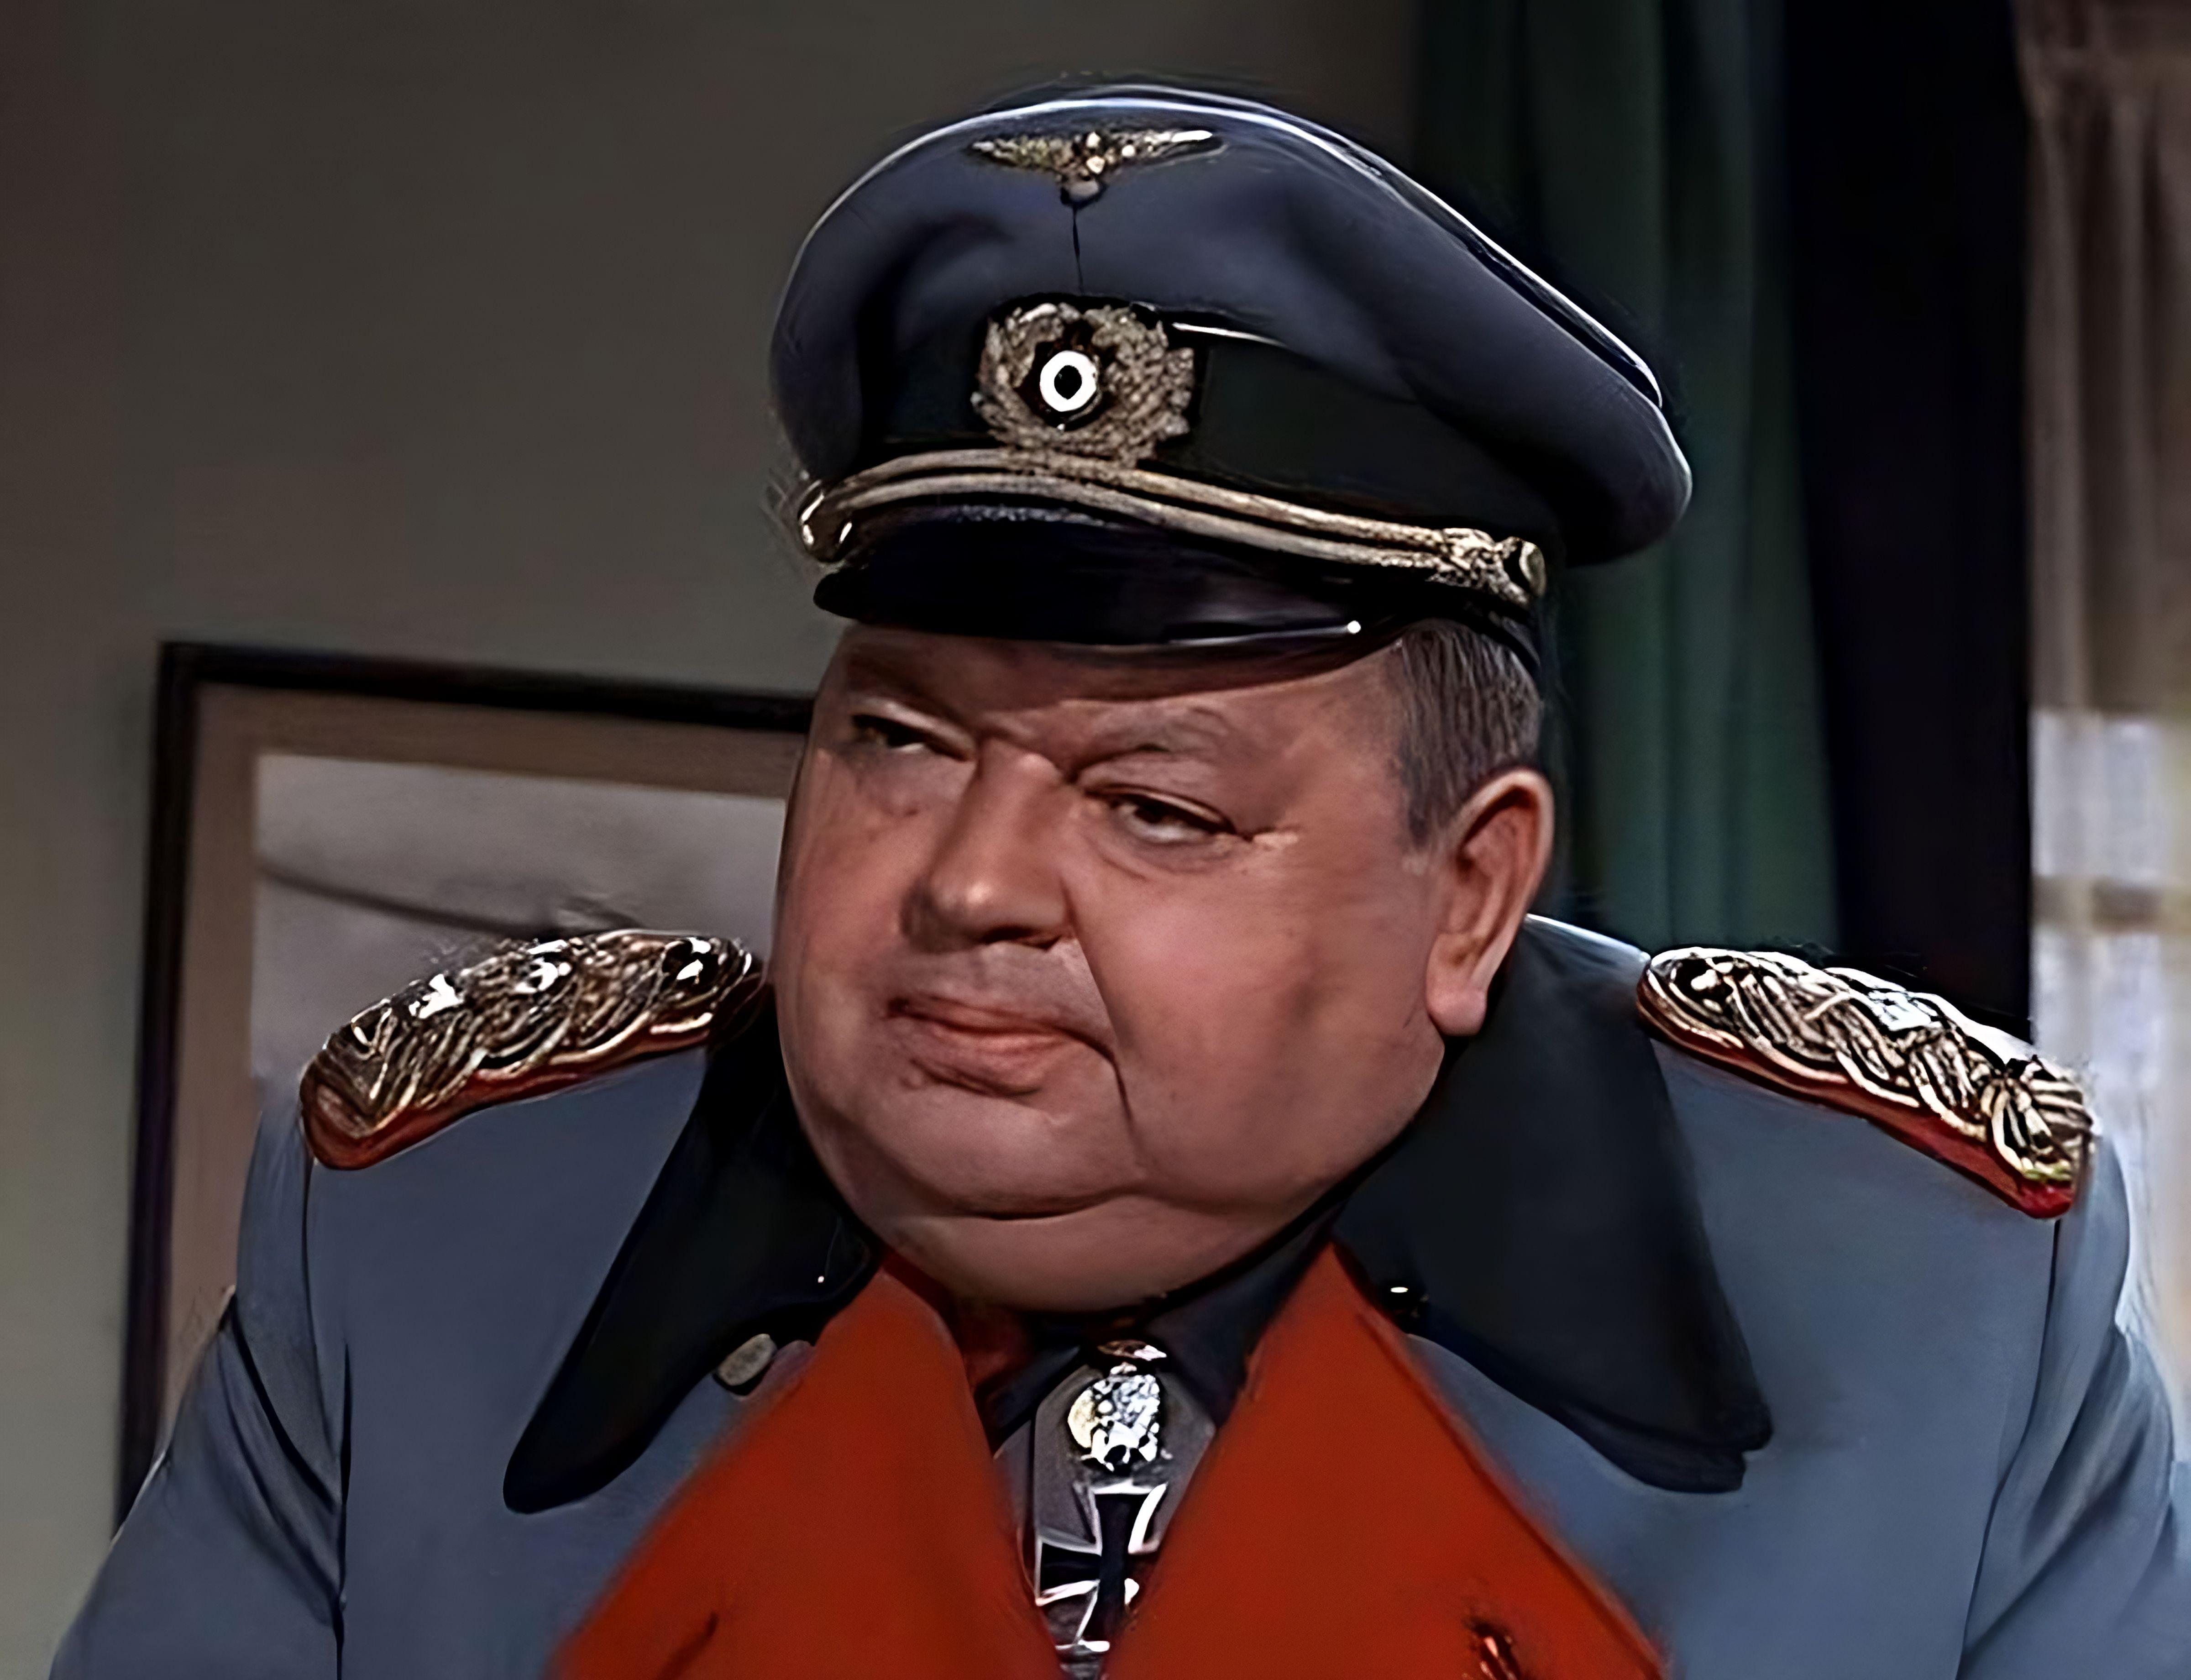 General Burkhalter